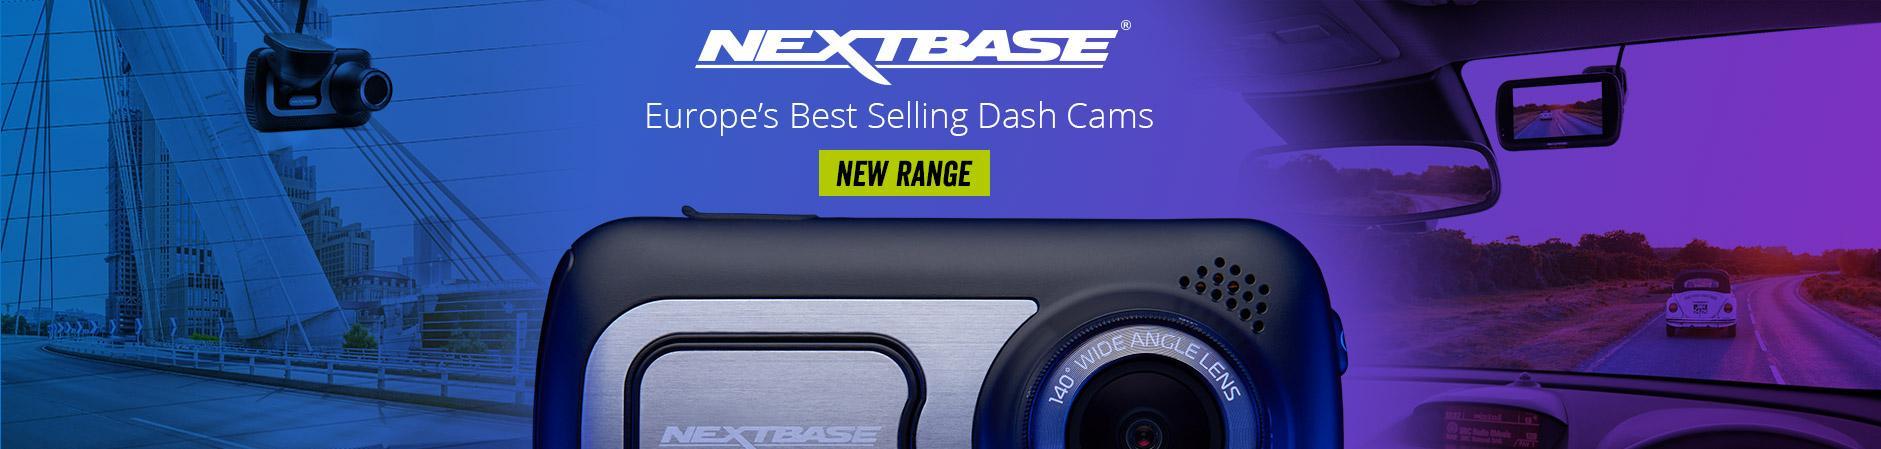 Nextbase banner